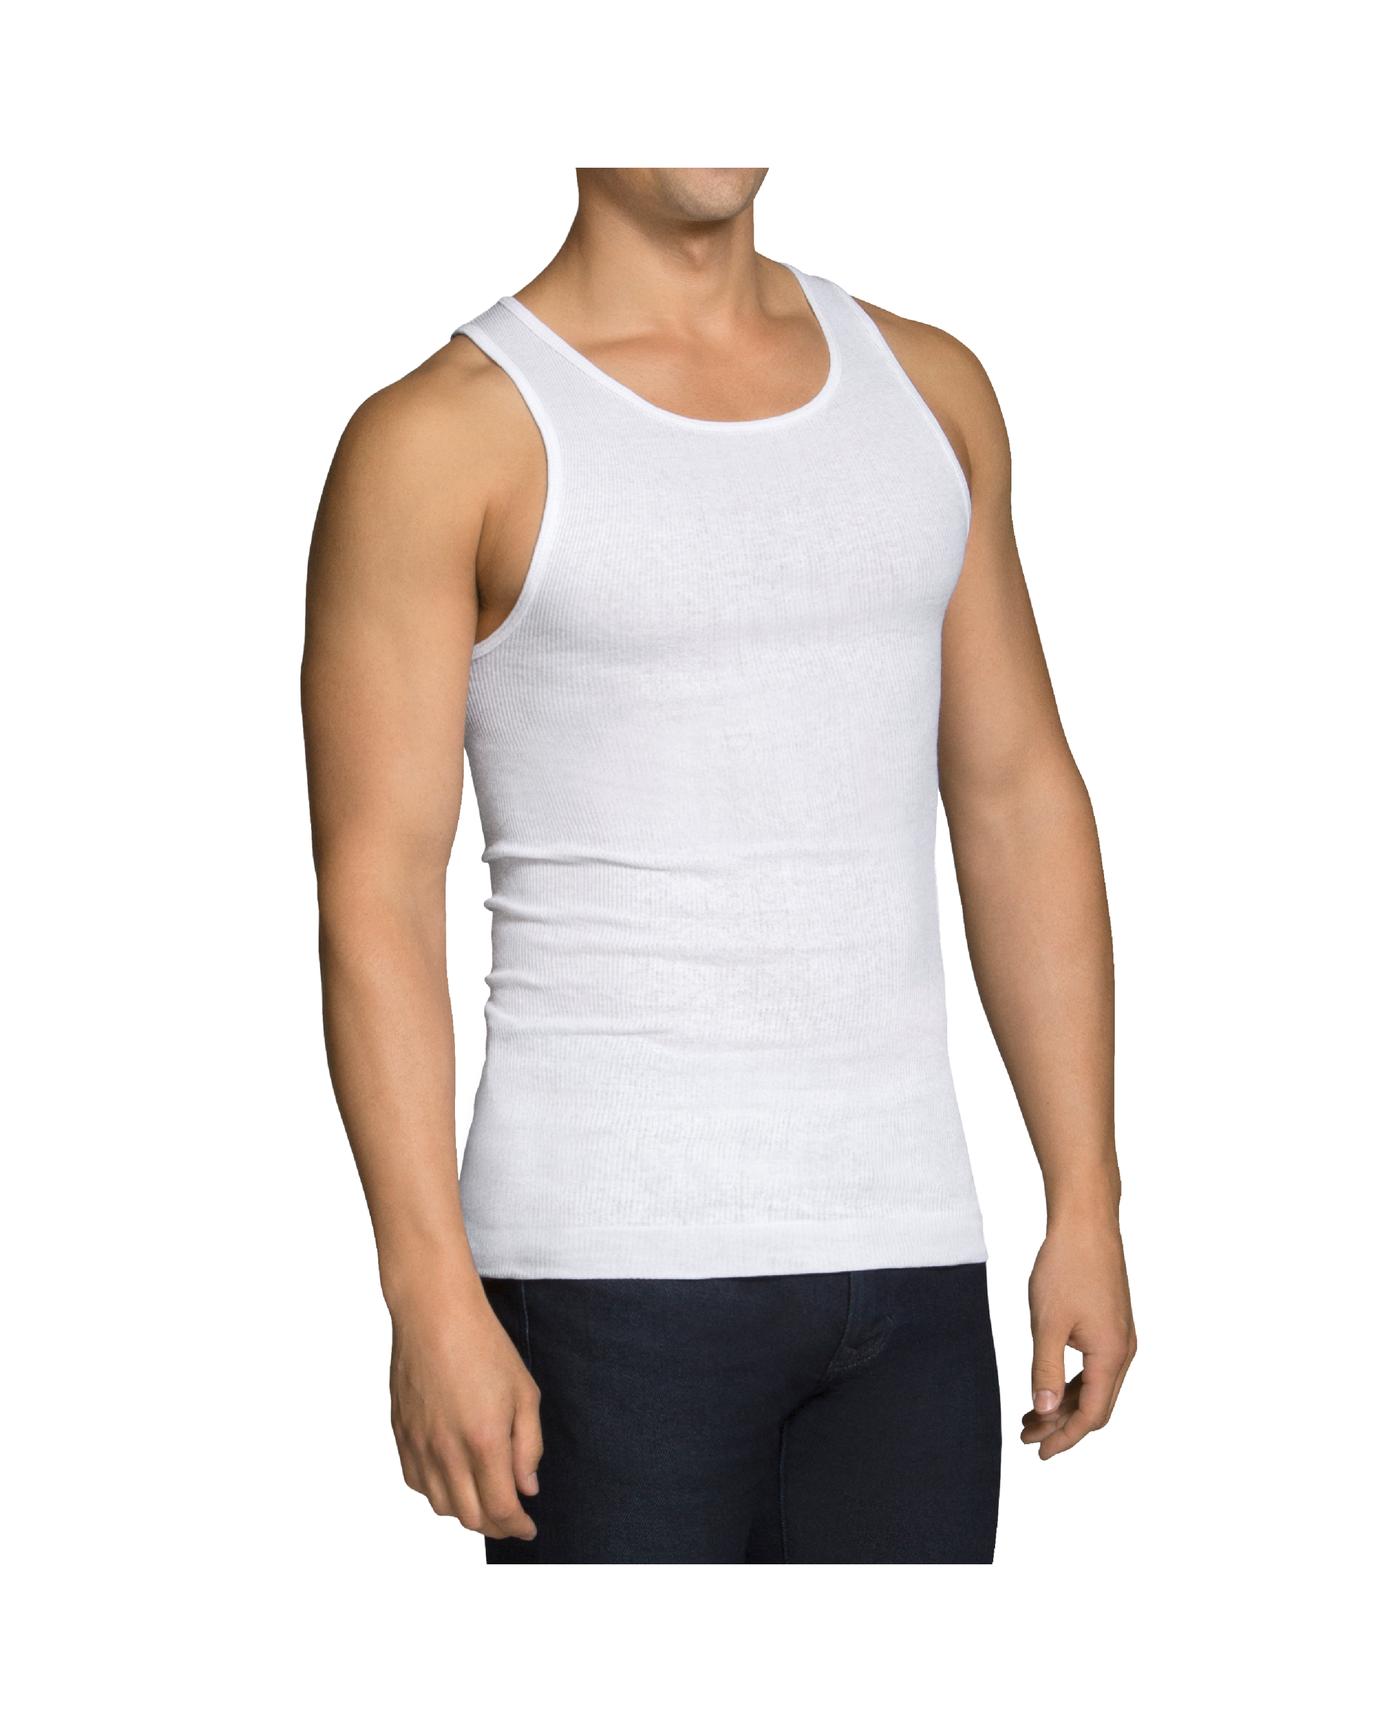 cd9e0986c4014 ... Men s Dual Defense White A-Shirts